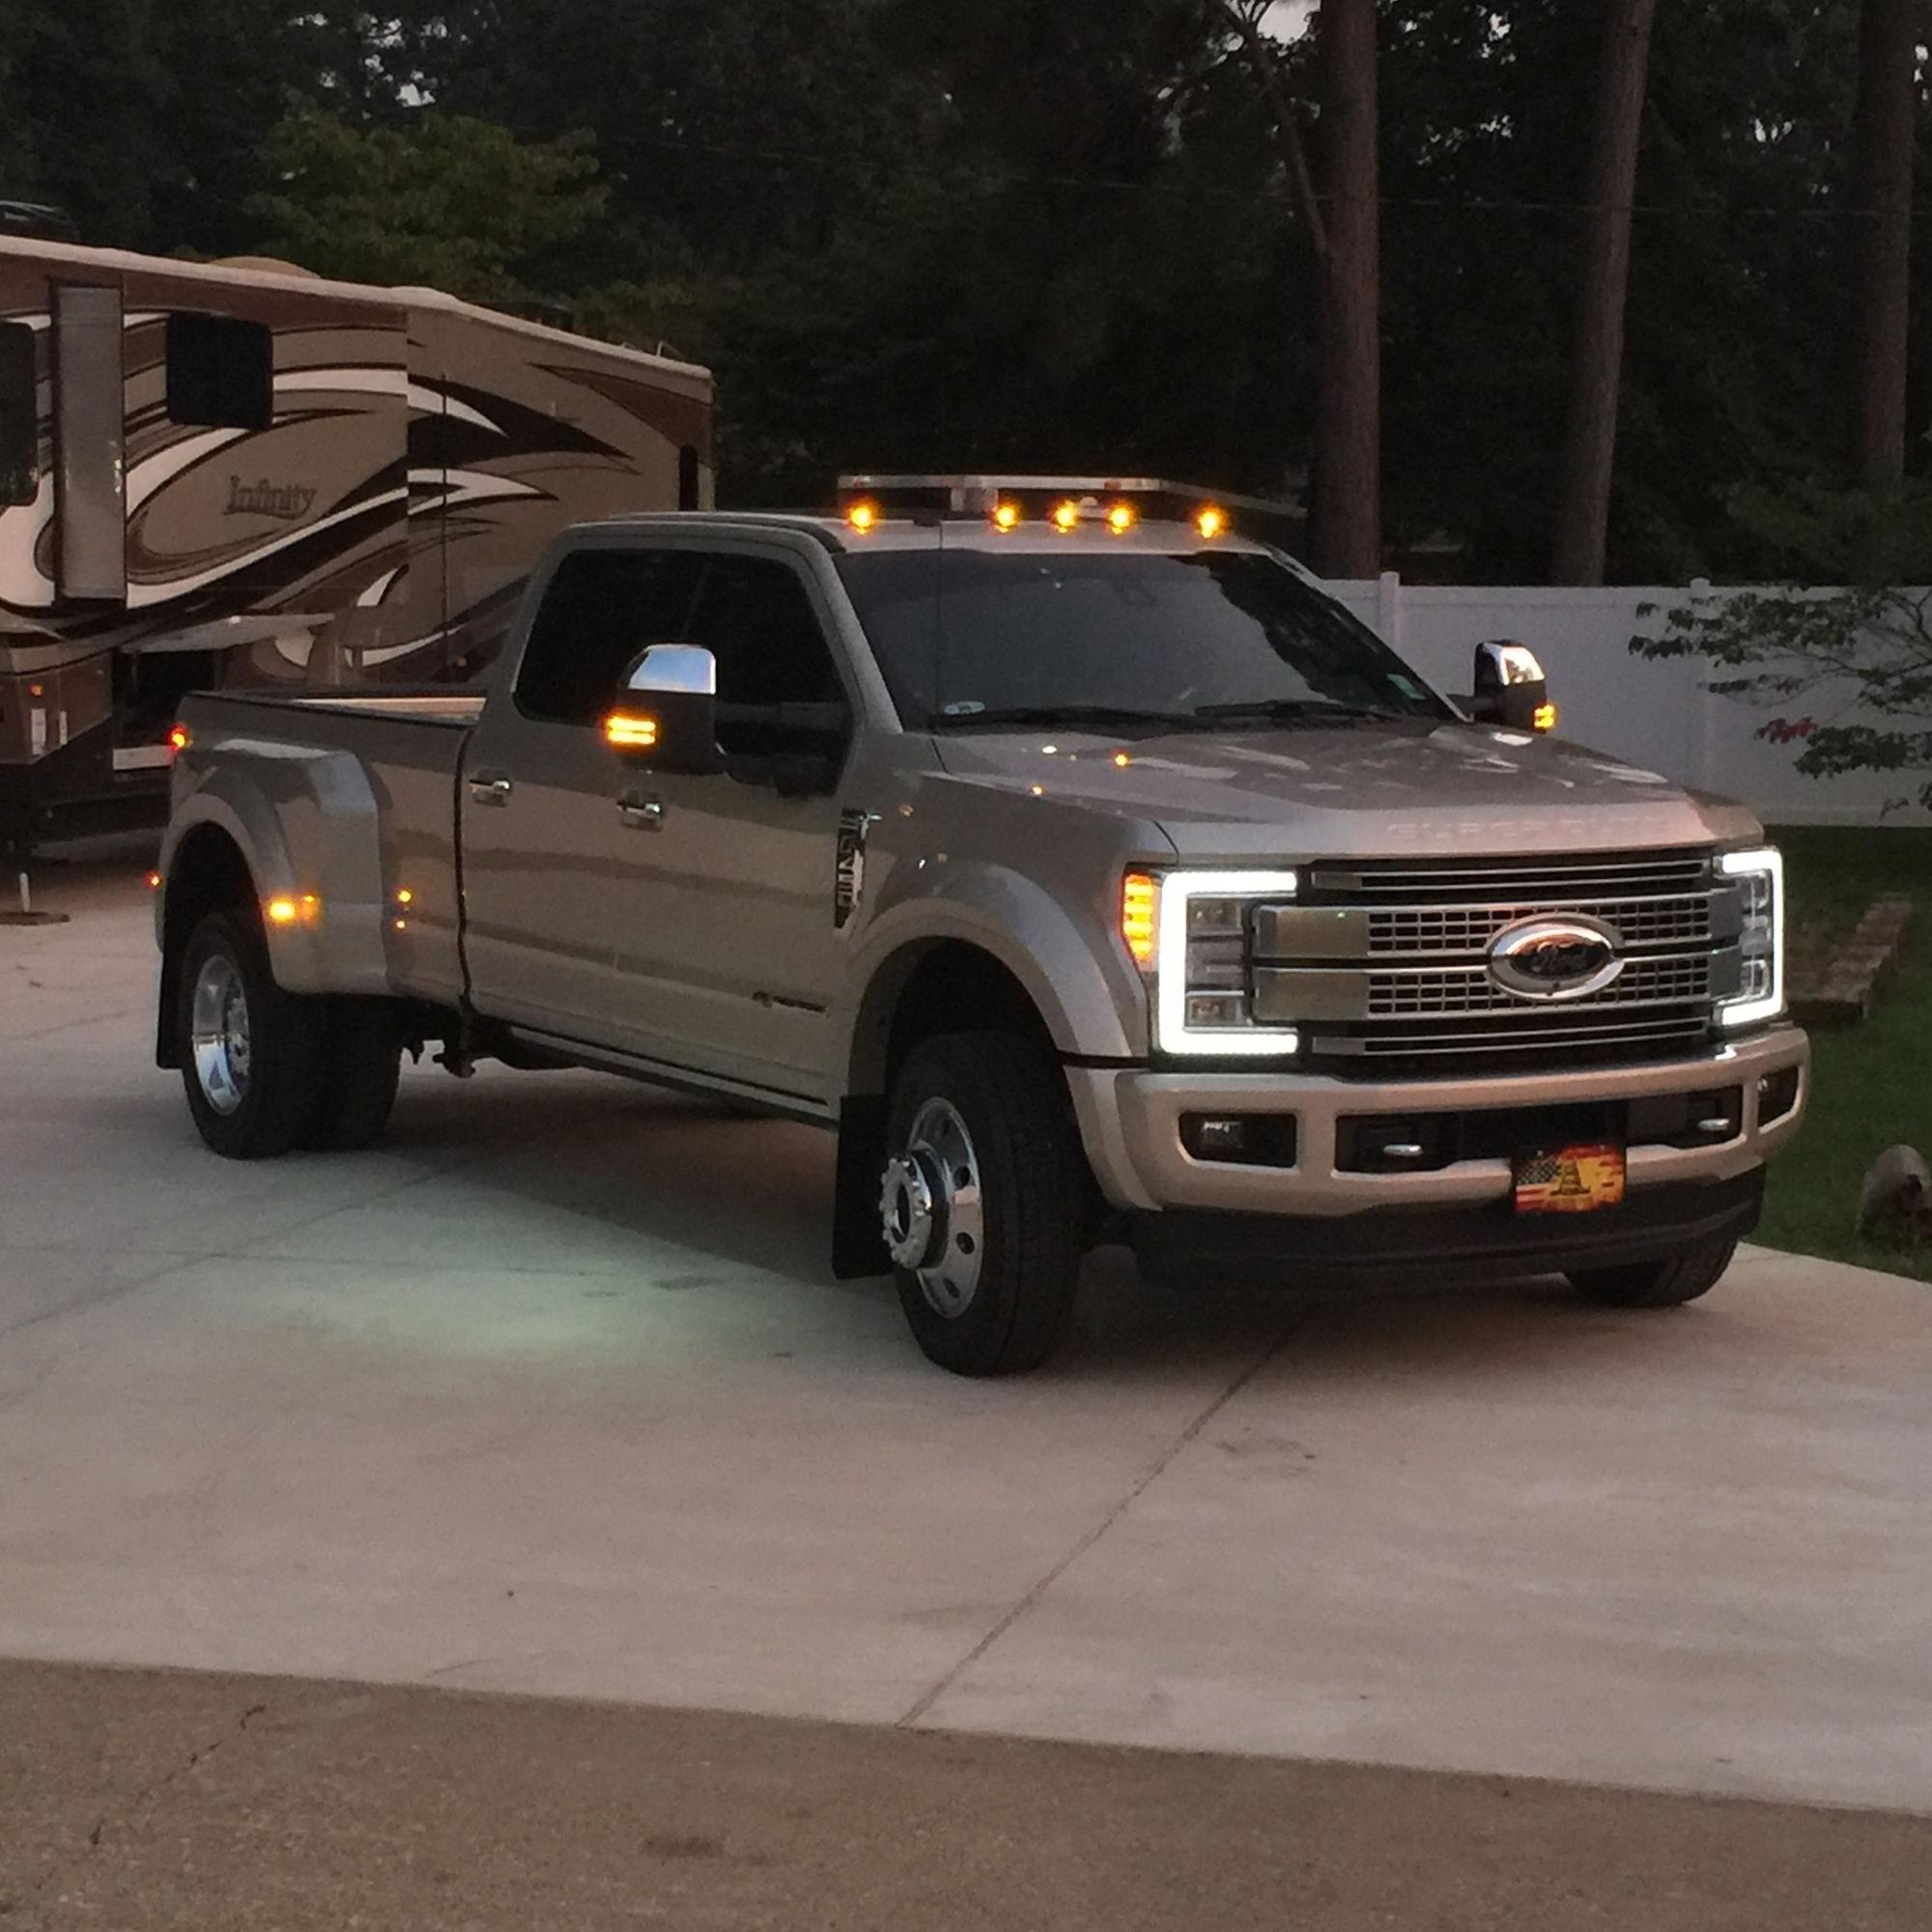 Truck Platinum: White Gold F-450 Platinum Delivered